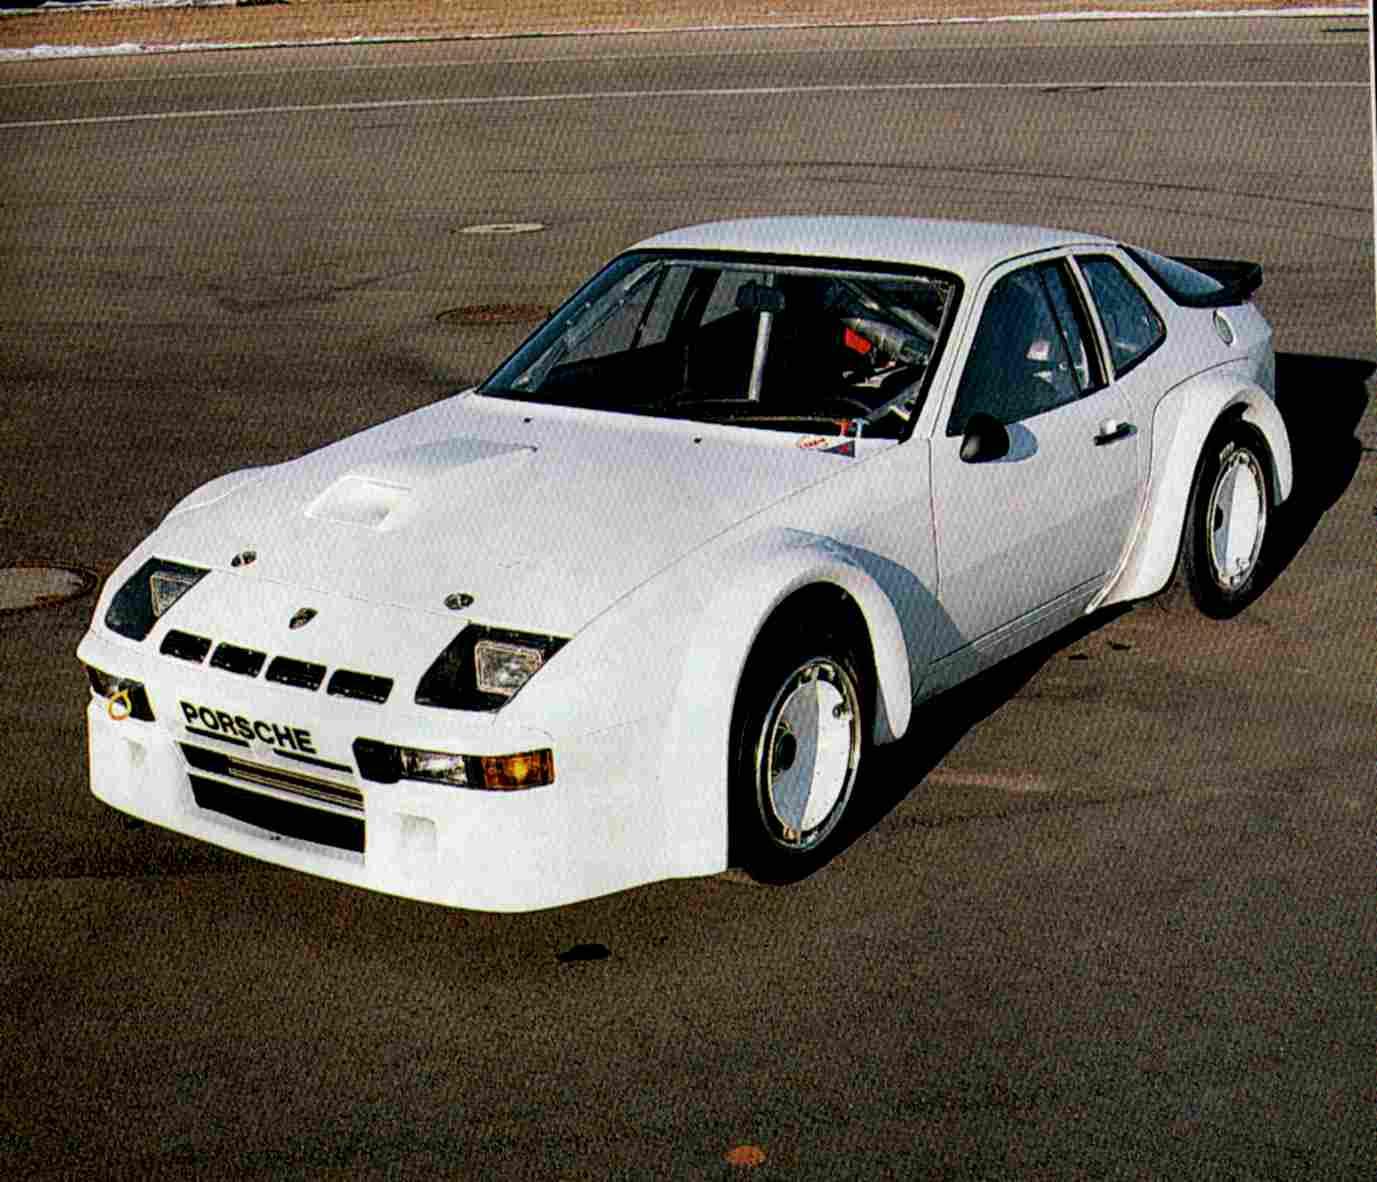 The Porsche 924 Carrera Gts